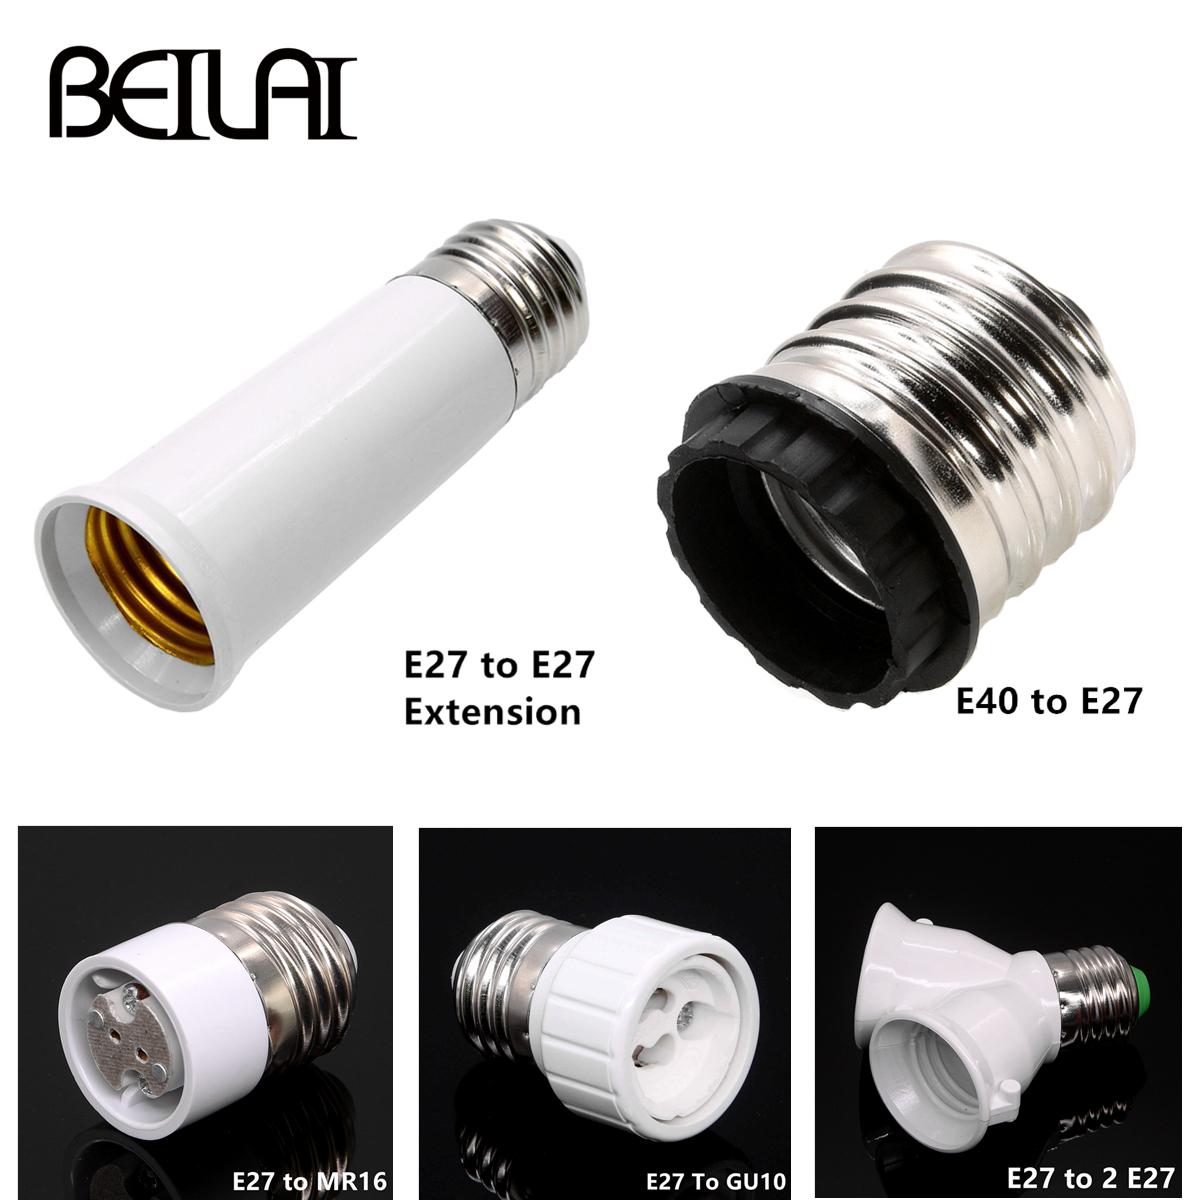 1x Converter E27 E14 MR16 GU10 G9 LED Bulbs Adapter Conversion Socket High Quality Material Fireproof Socket Adapter Lamp Holder